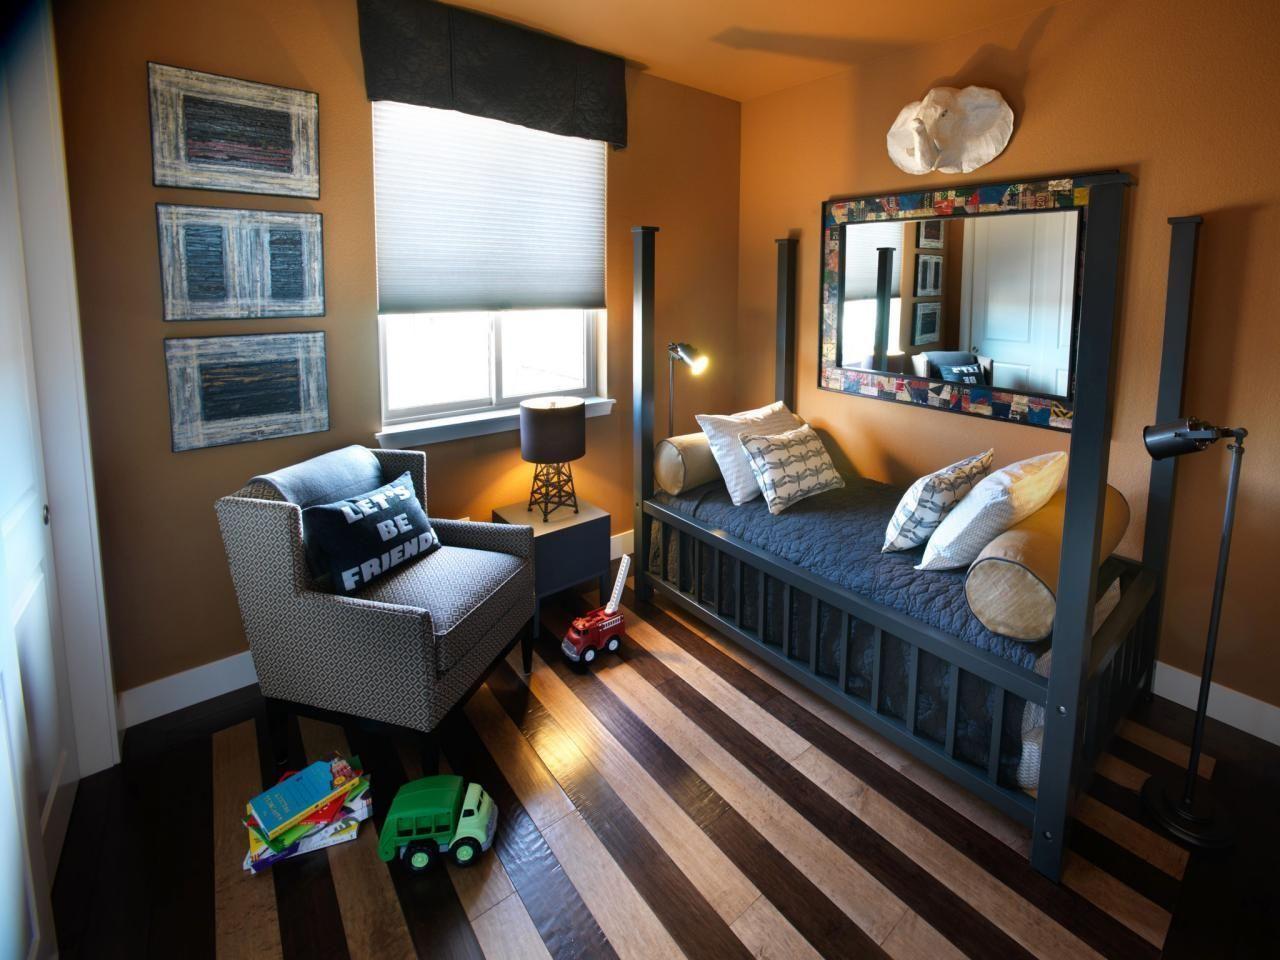 kids room flooring ideas wall decor ideas for bedroom check